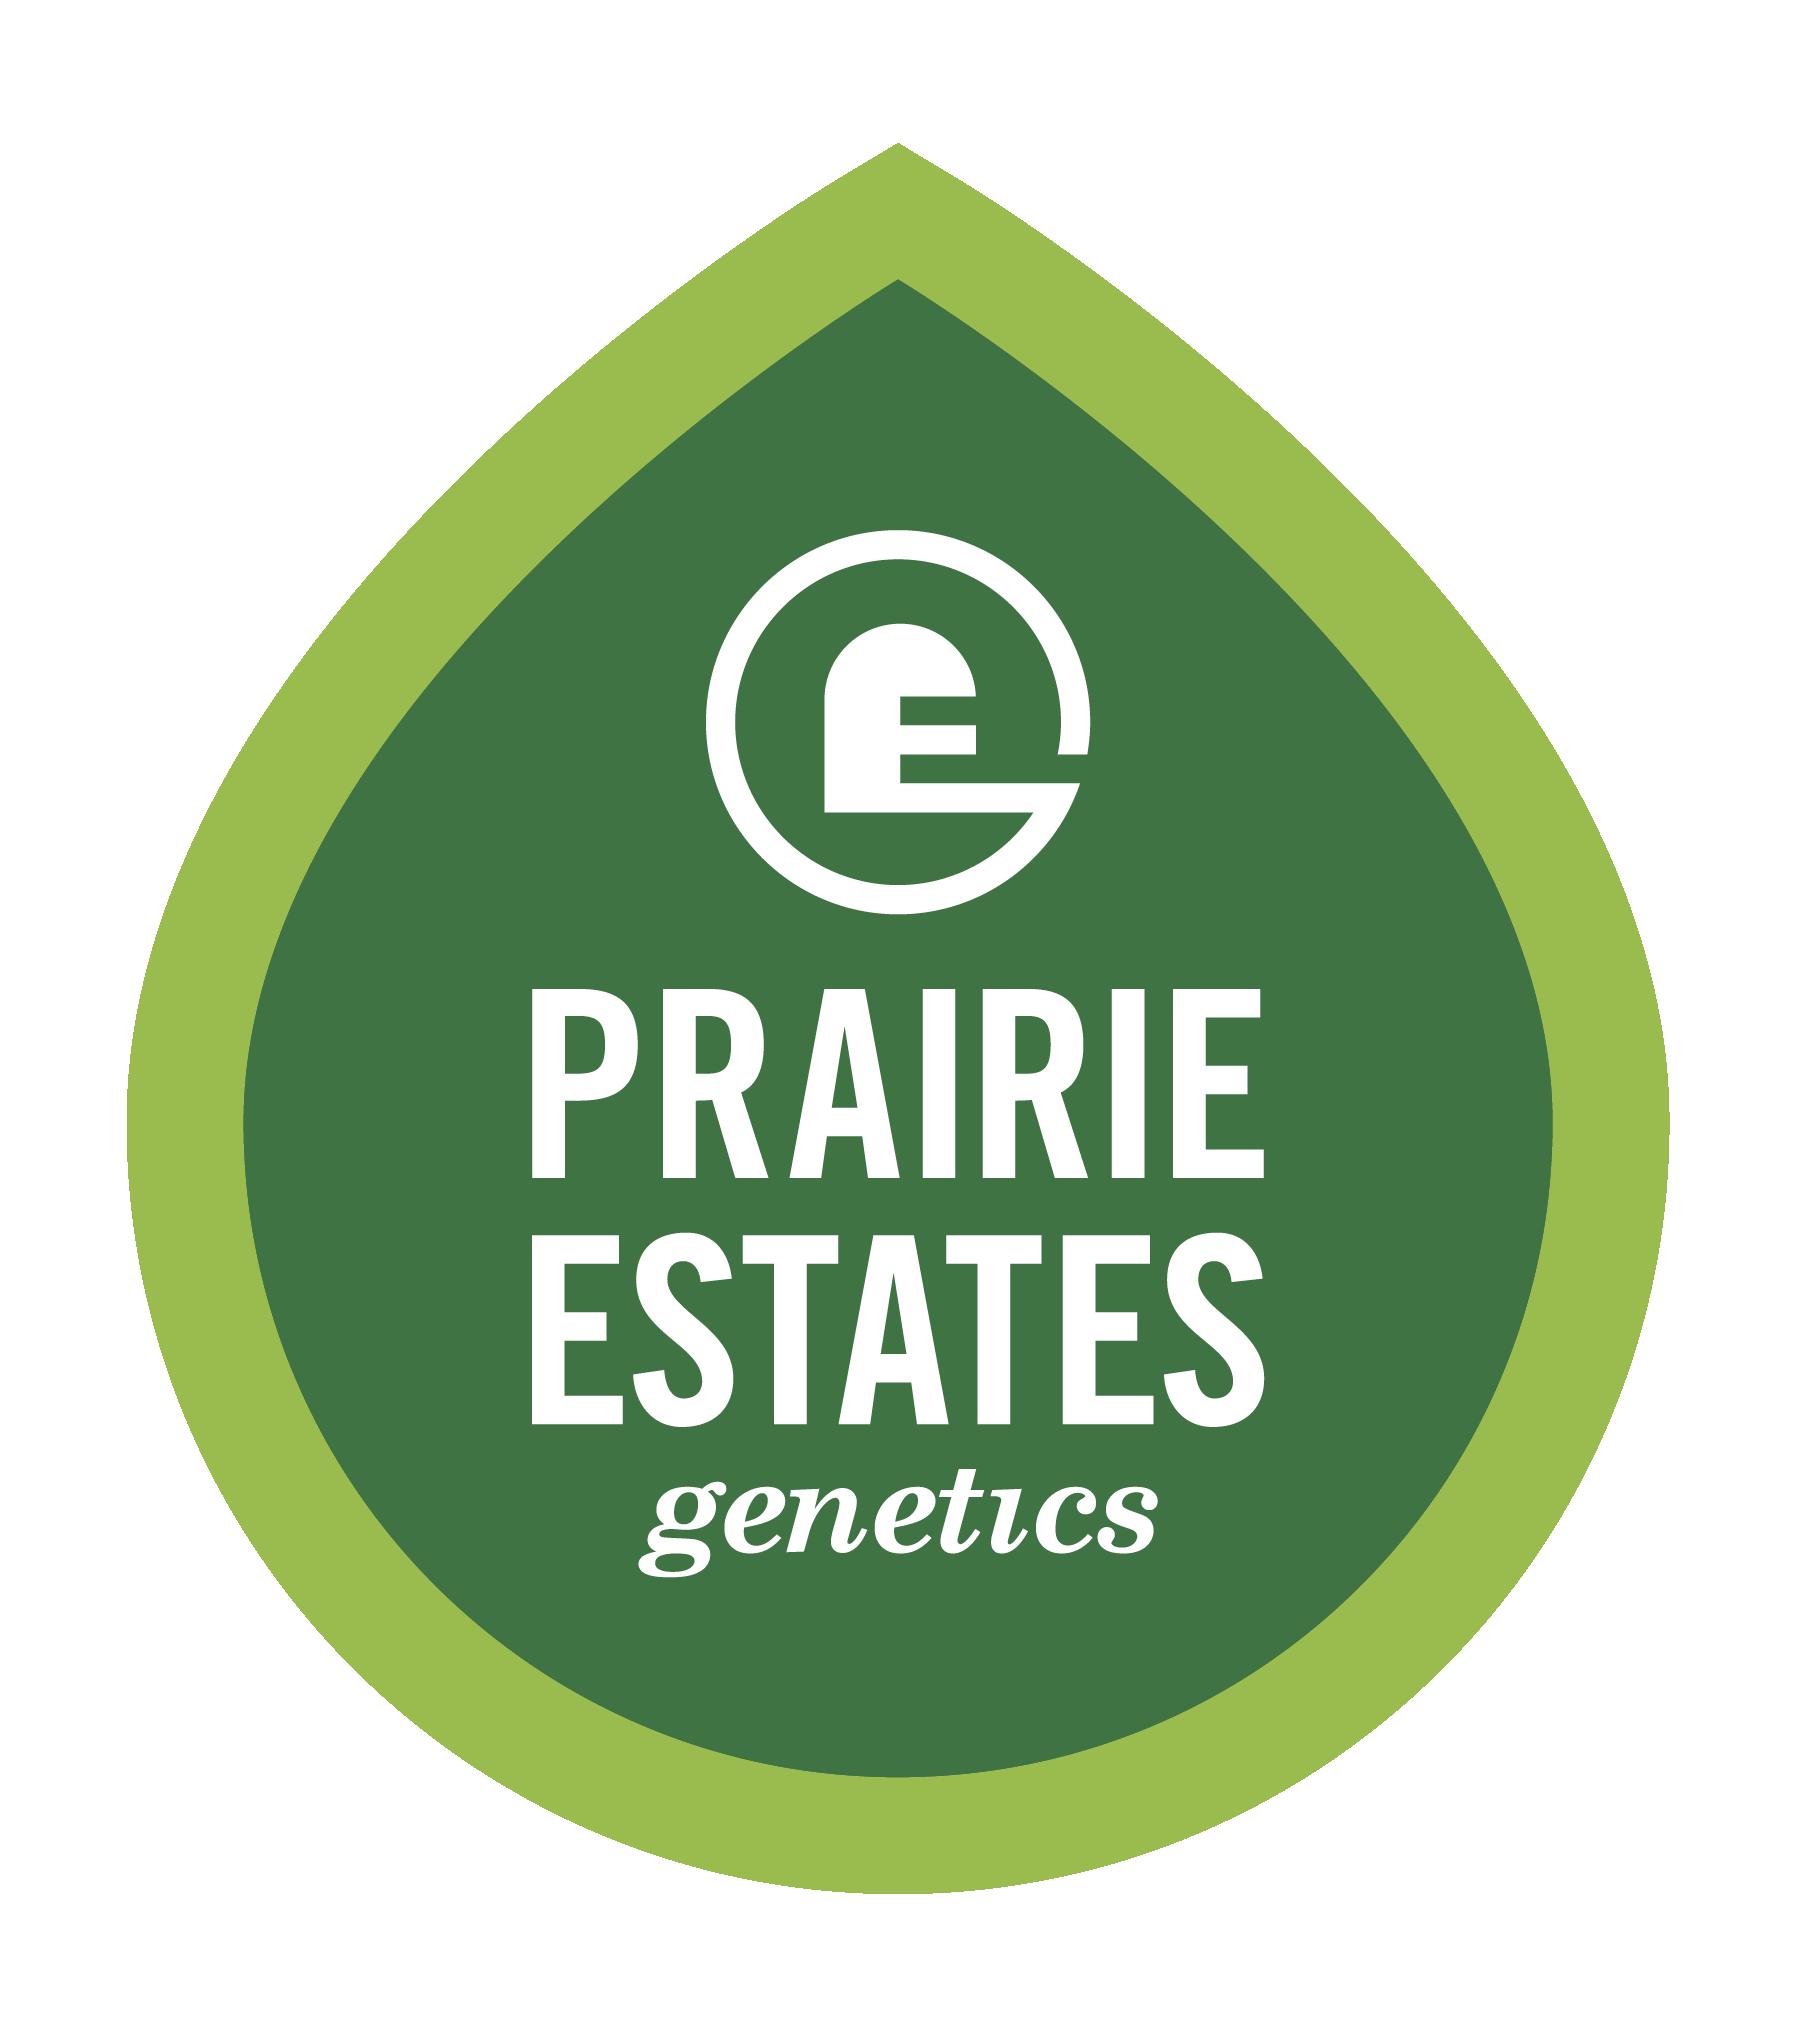 prairie estate genetics